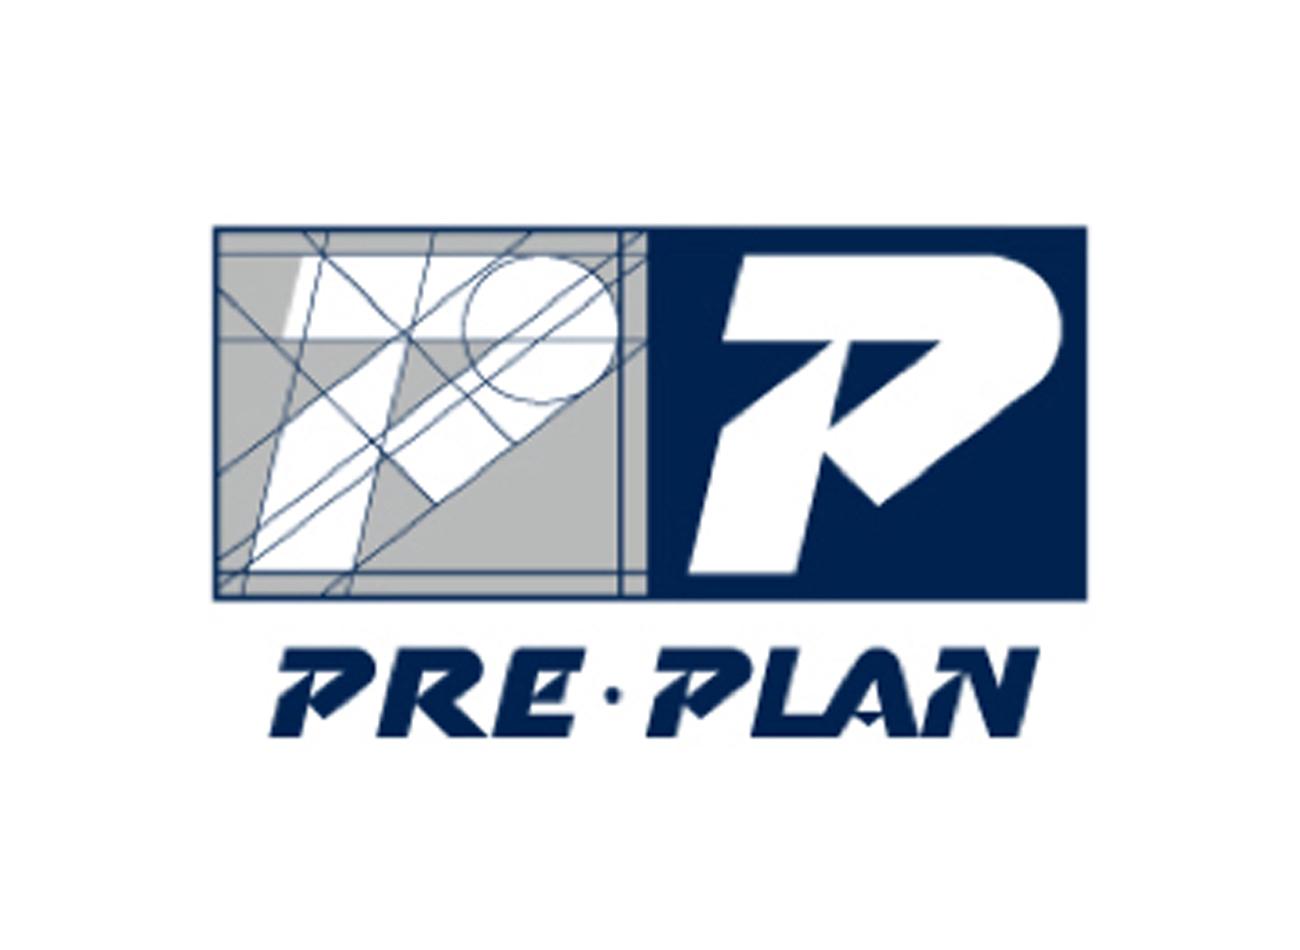 pre-plan-preplan-iconic-logo-designers-agent-orange-graphic-agency-south-african-branding-companies.jpg